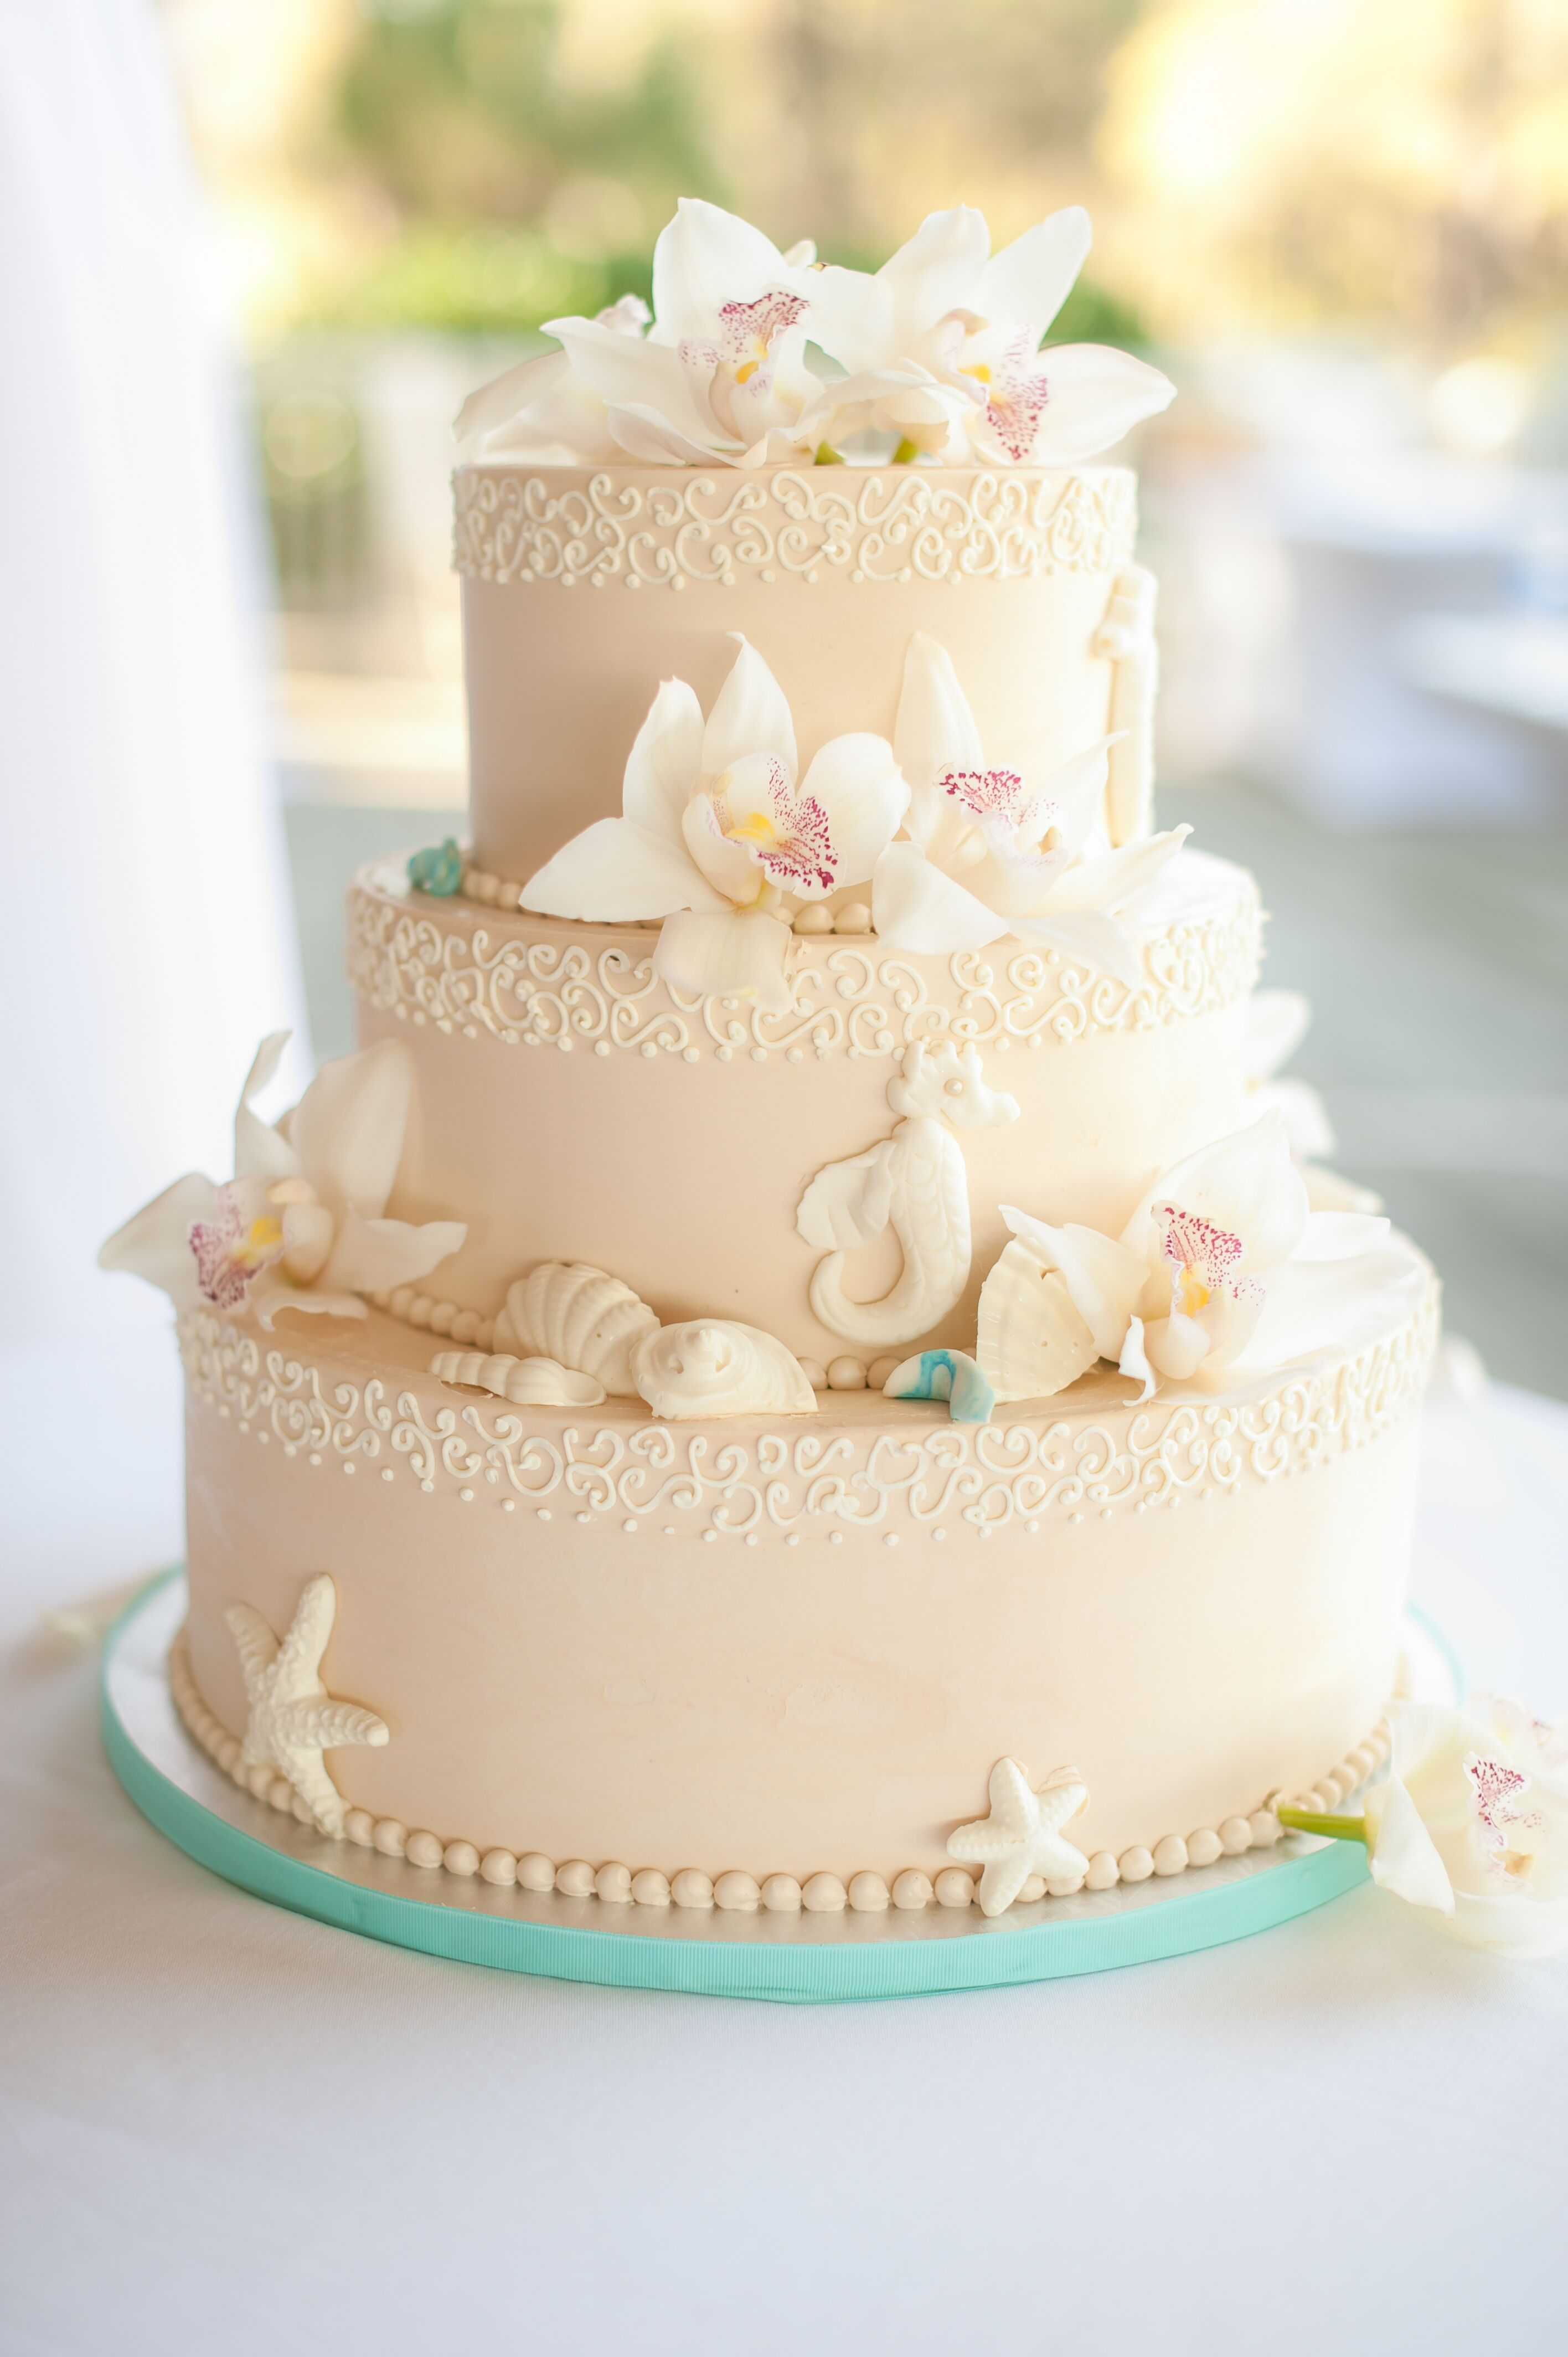 beach themed wedding cake with seashells and seahorses